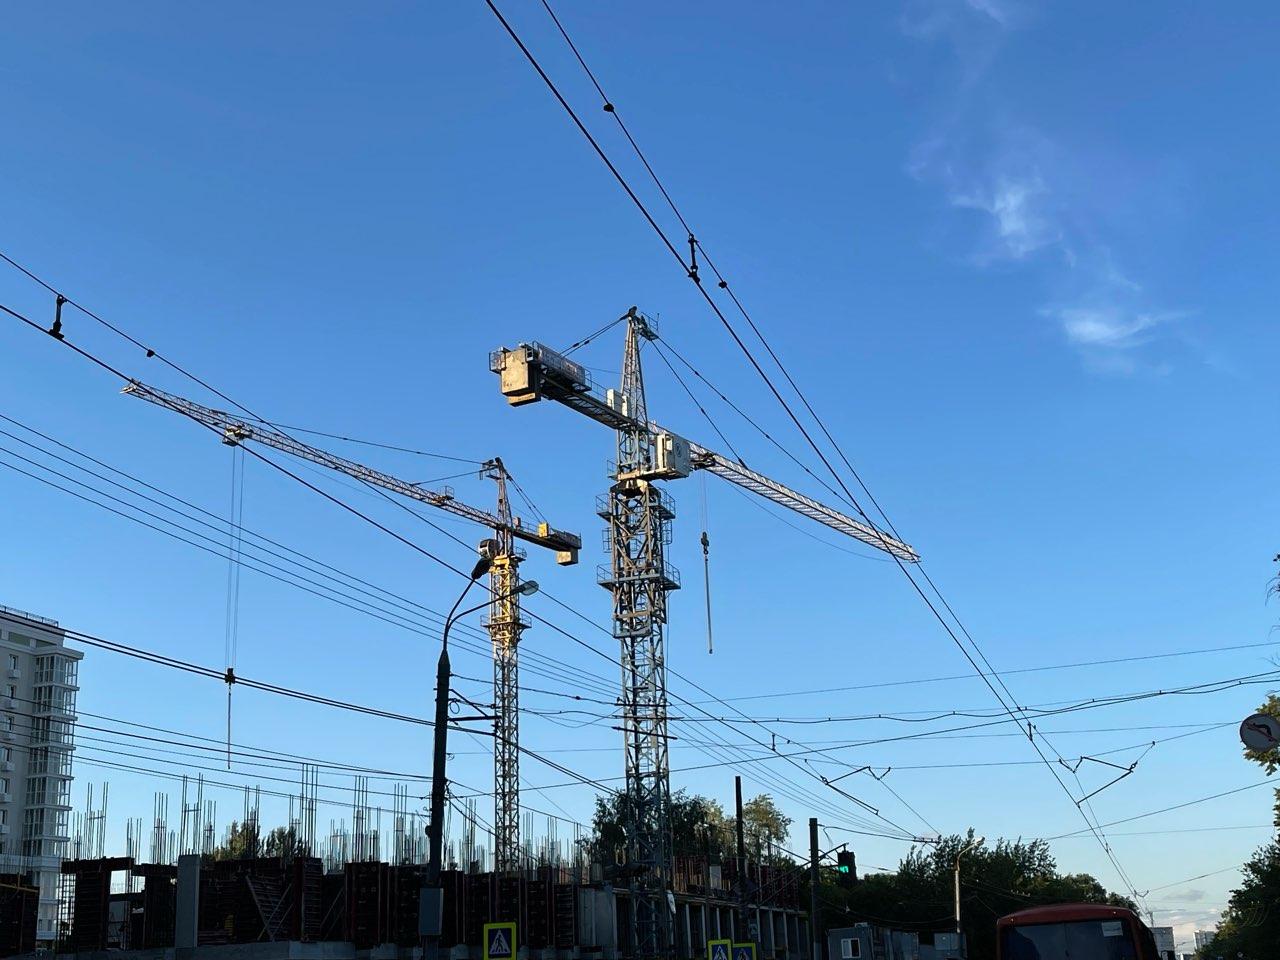 Общежитие Нижегородской академии МВД на 1000 мест достроят за 344,6 млн рублей - фото 1